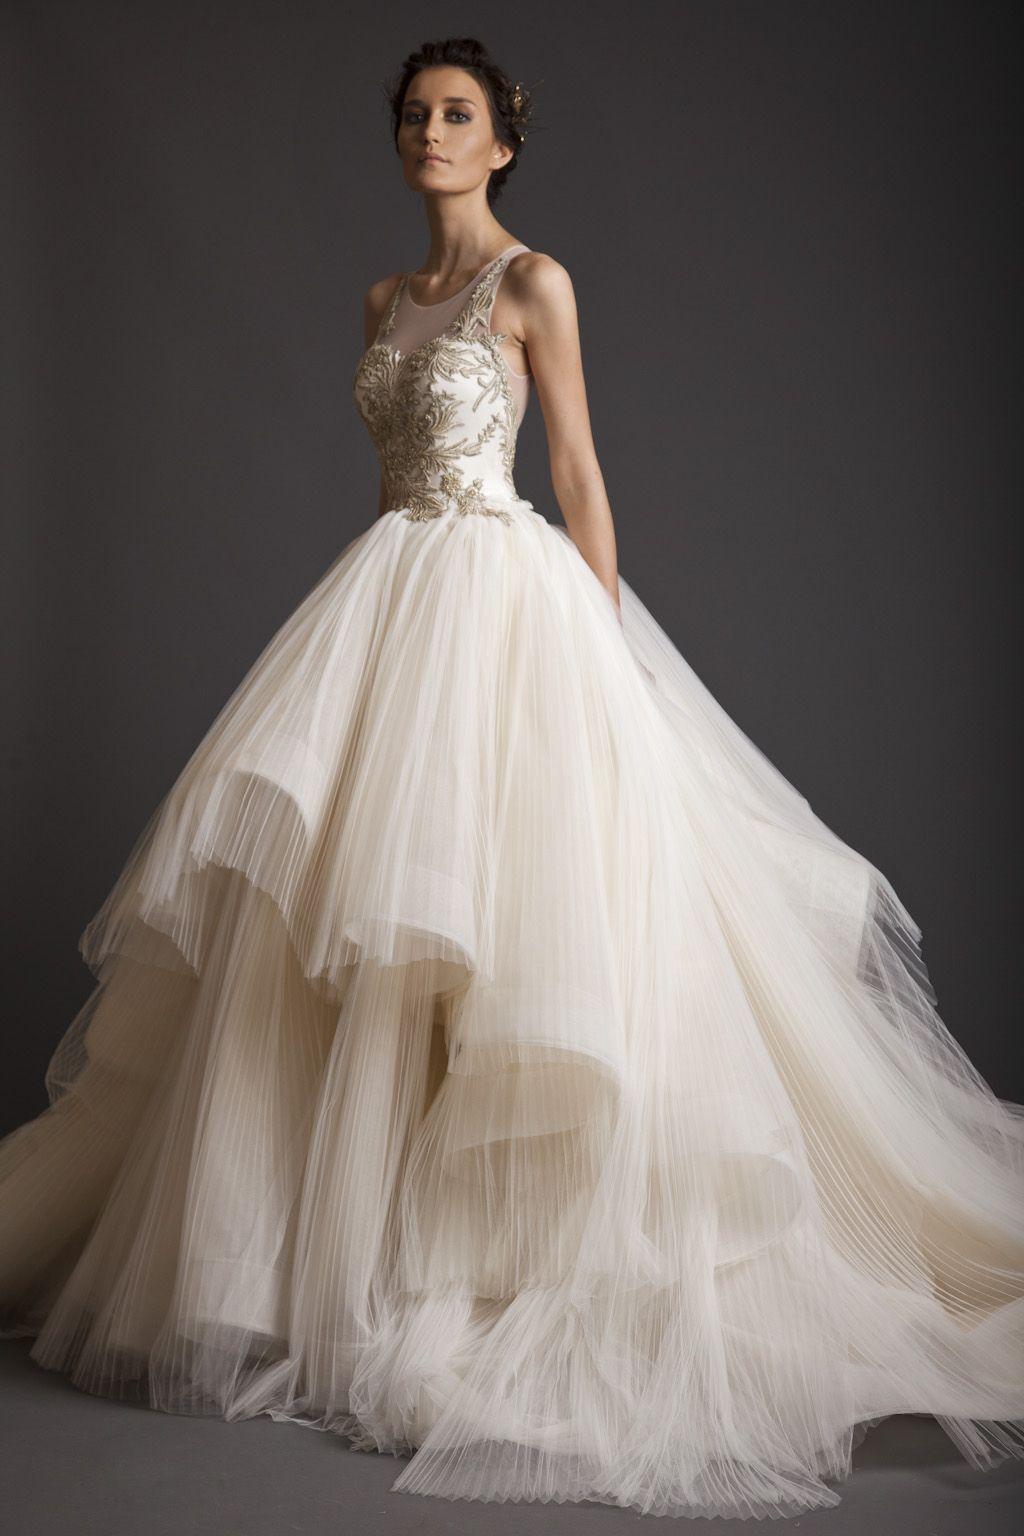 Nicole Jolies Collection 2016 — Colored Wedding Dresses | Wedding ...